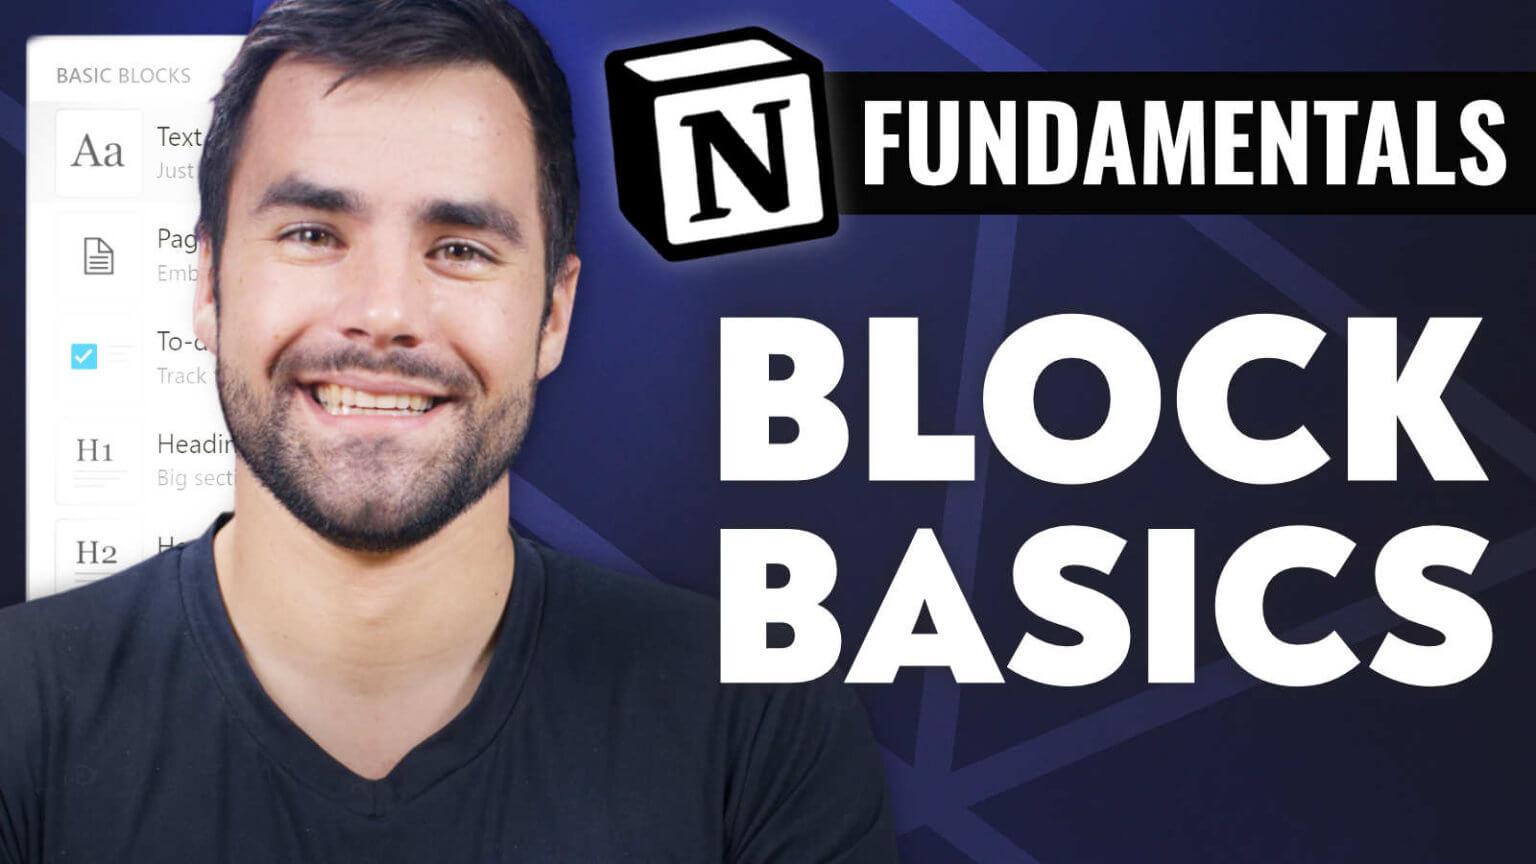 Block Basics - Notion Fundamentals with Thomas Frank